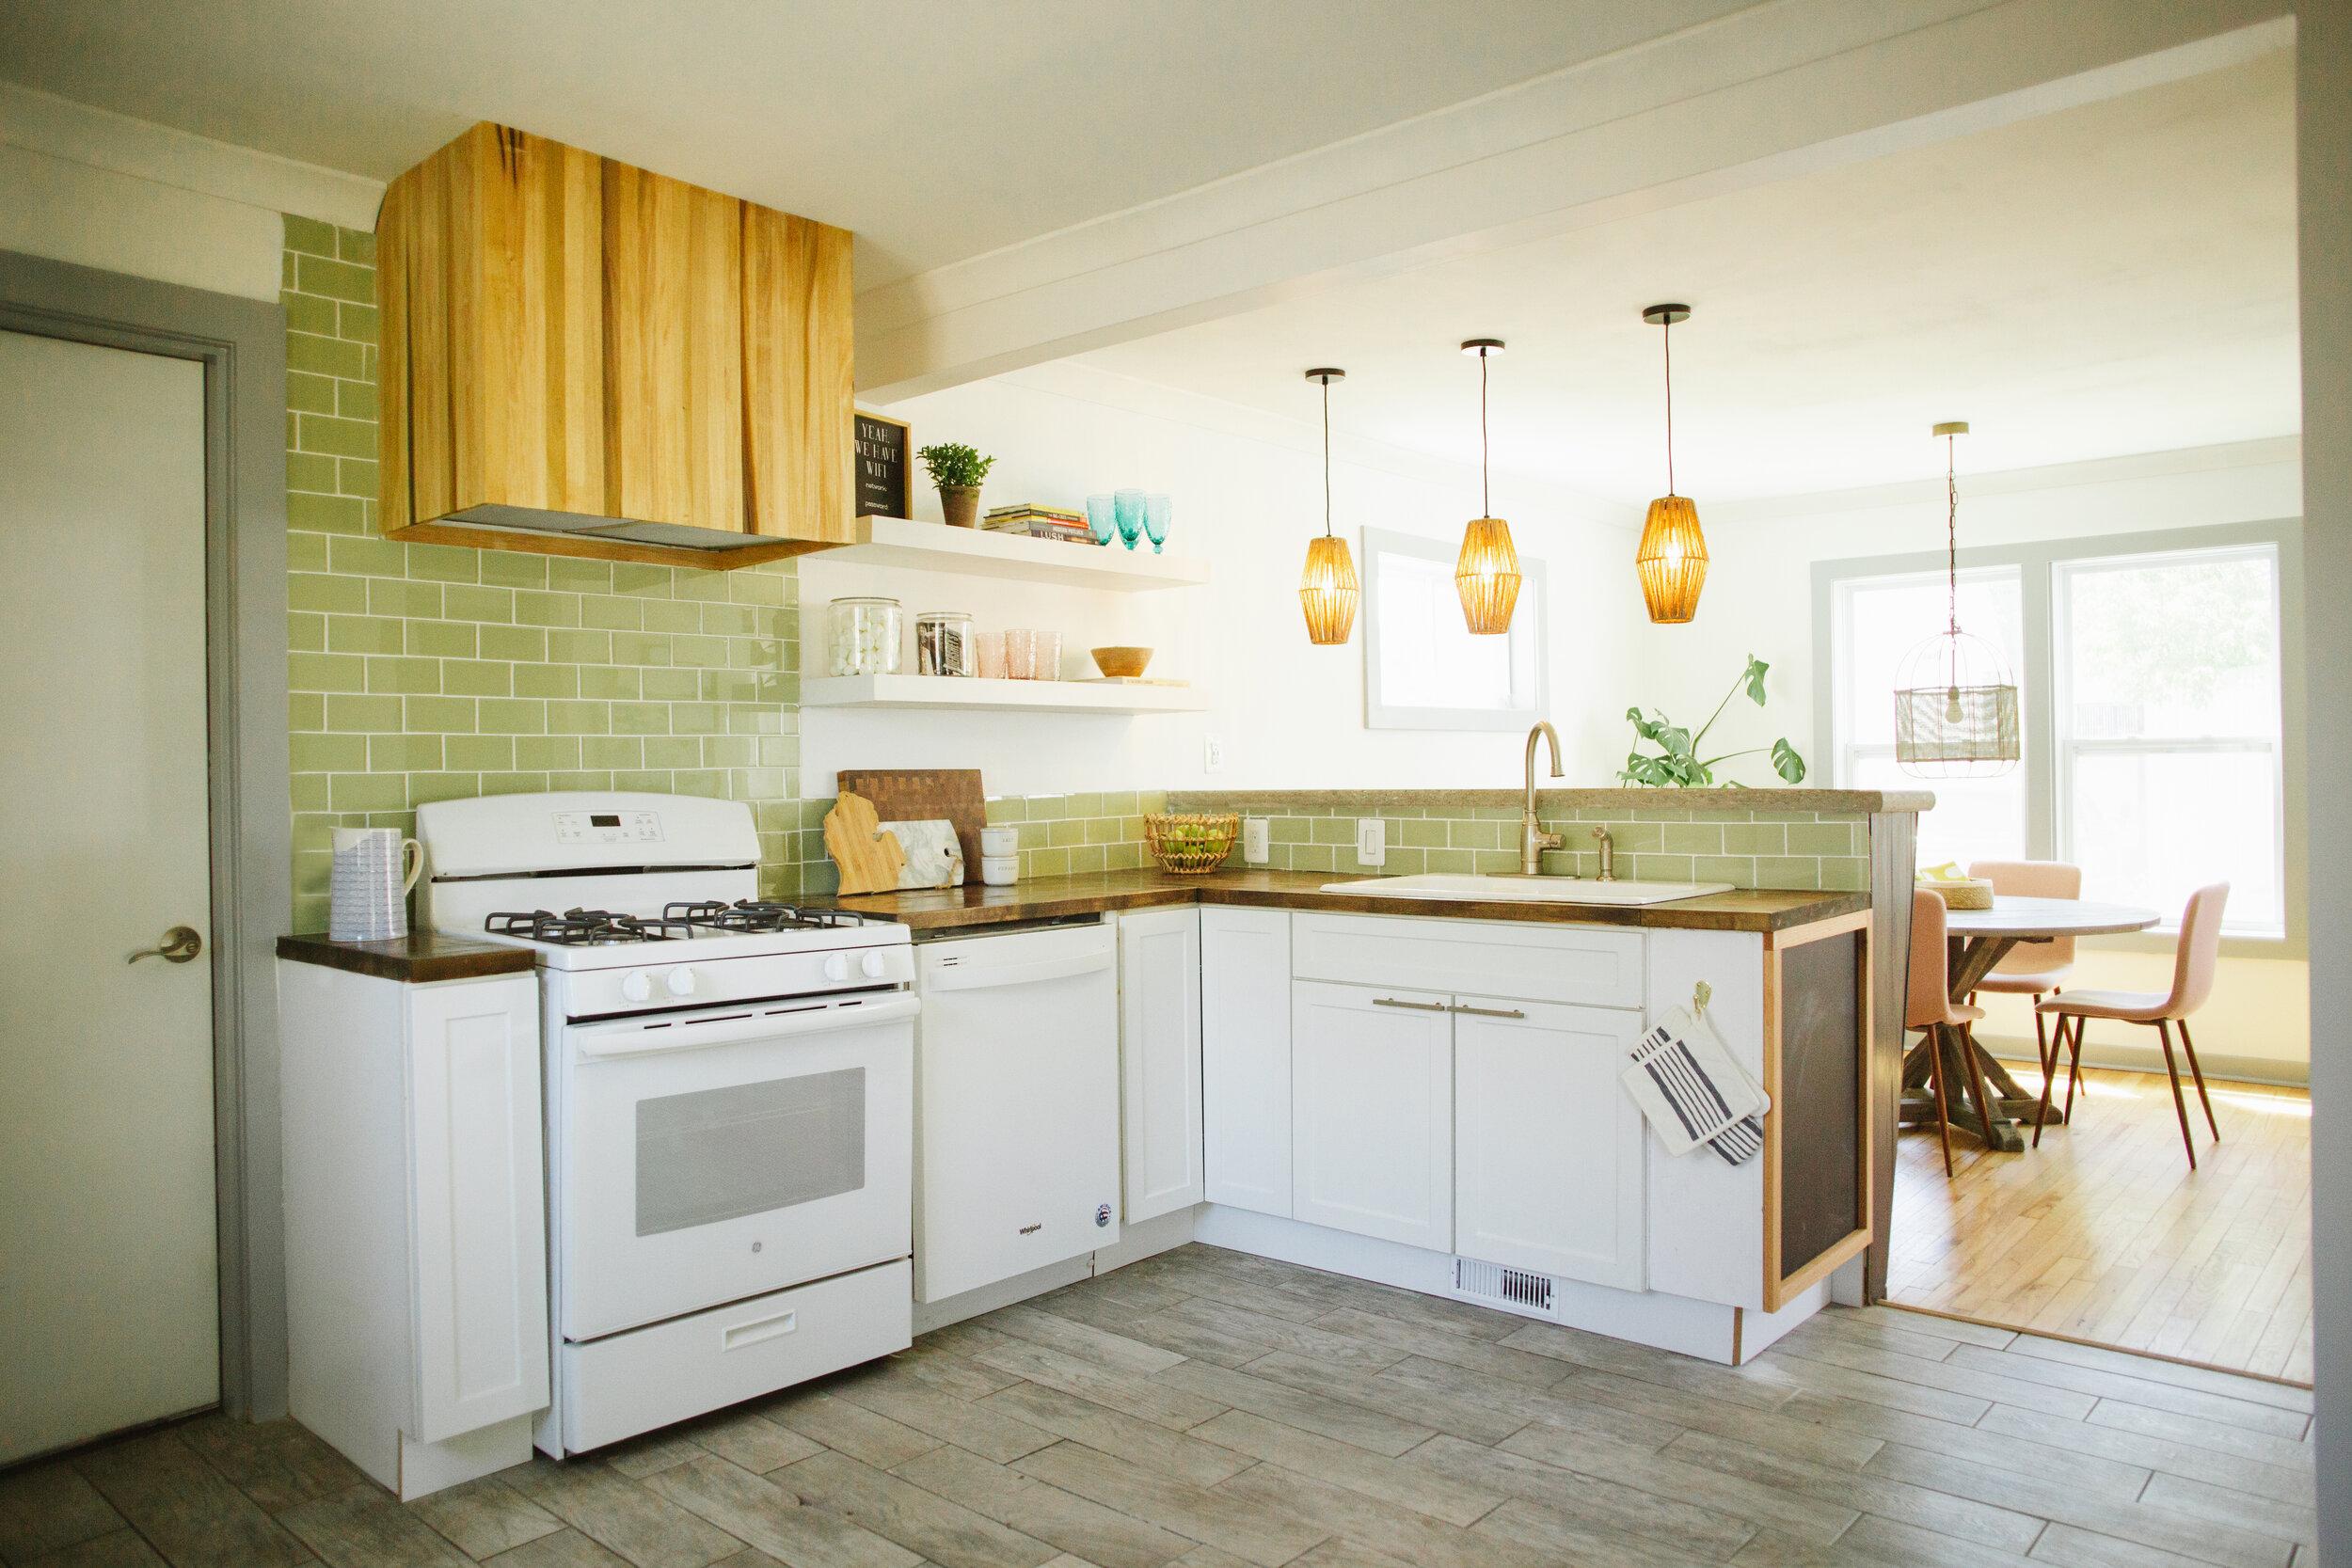 White appliances and a green glass backsplash add to the coastal vibe.